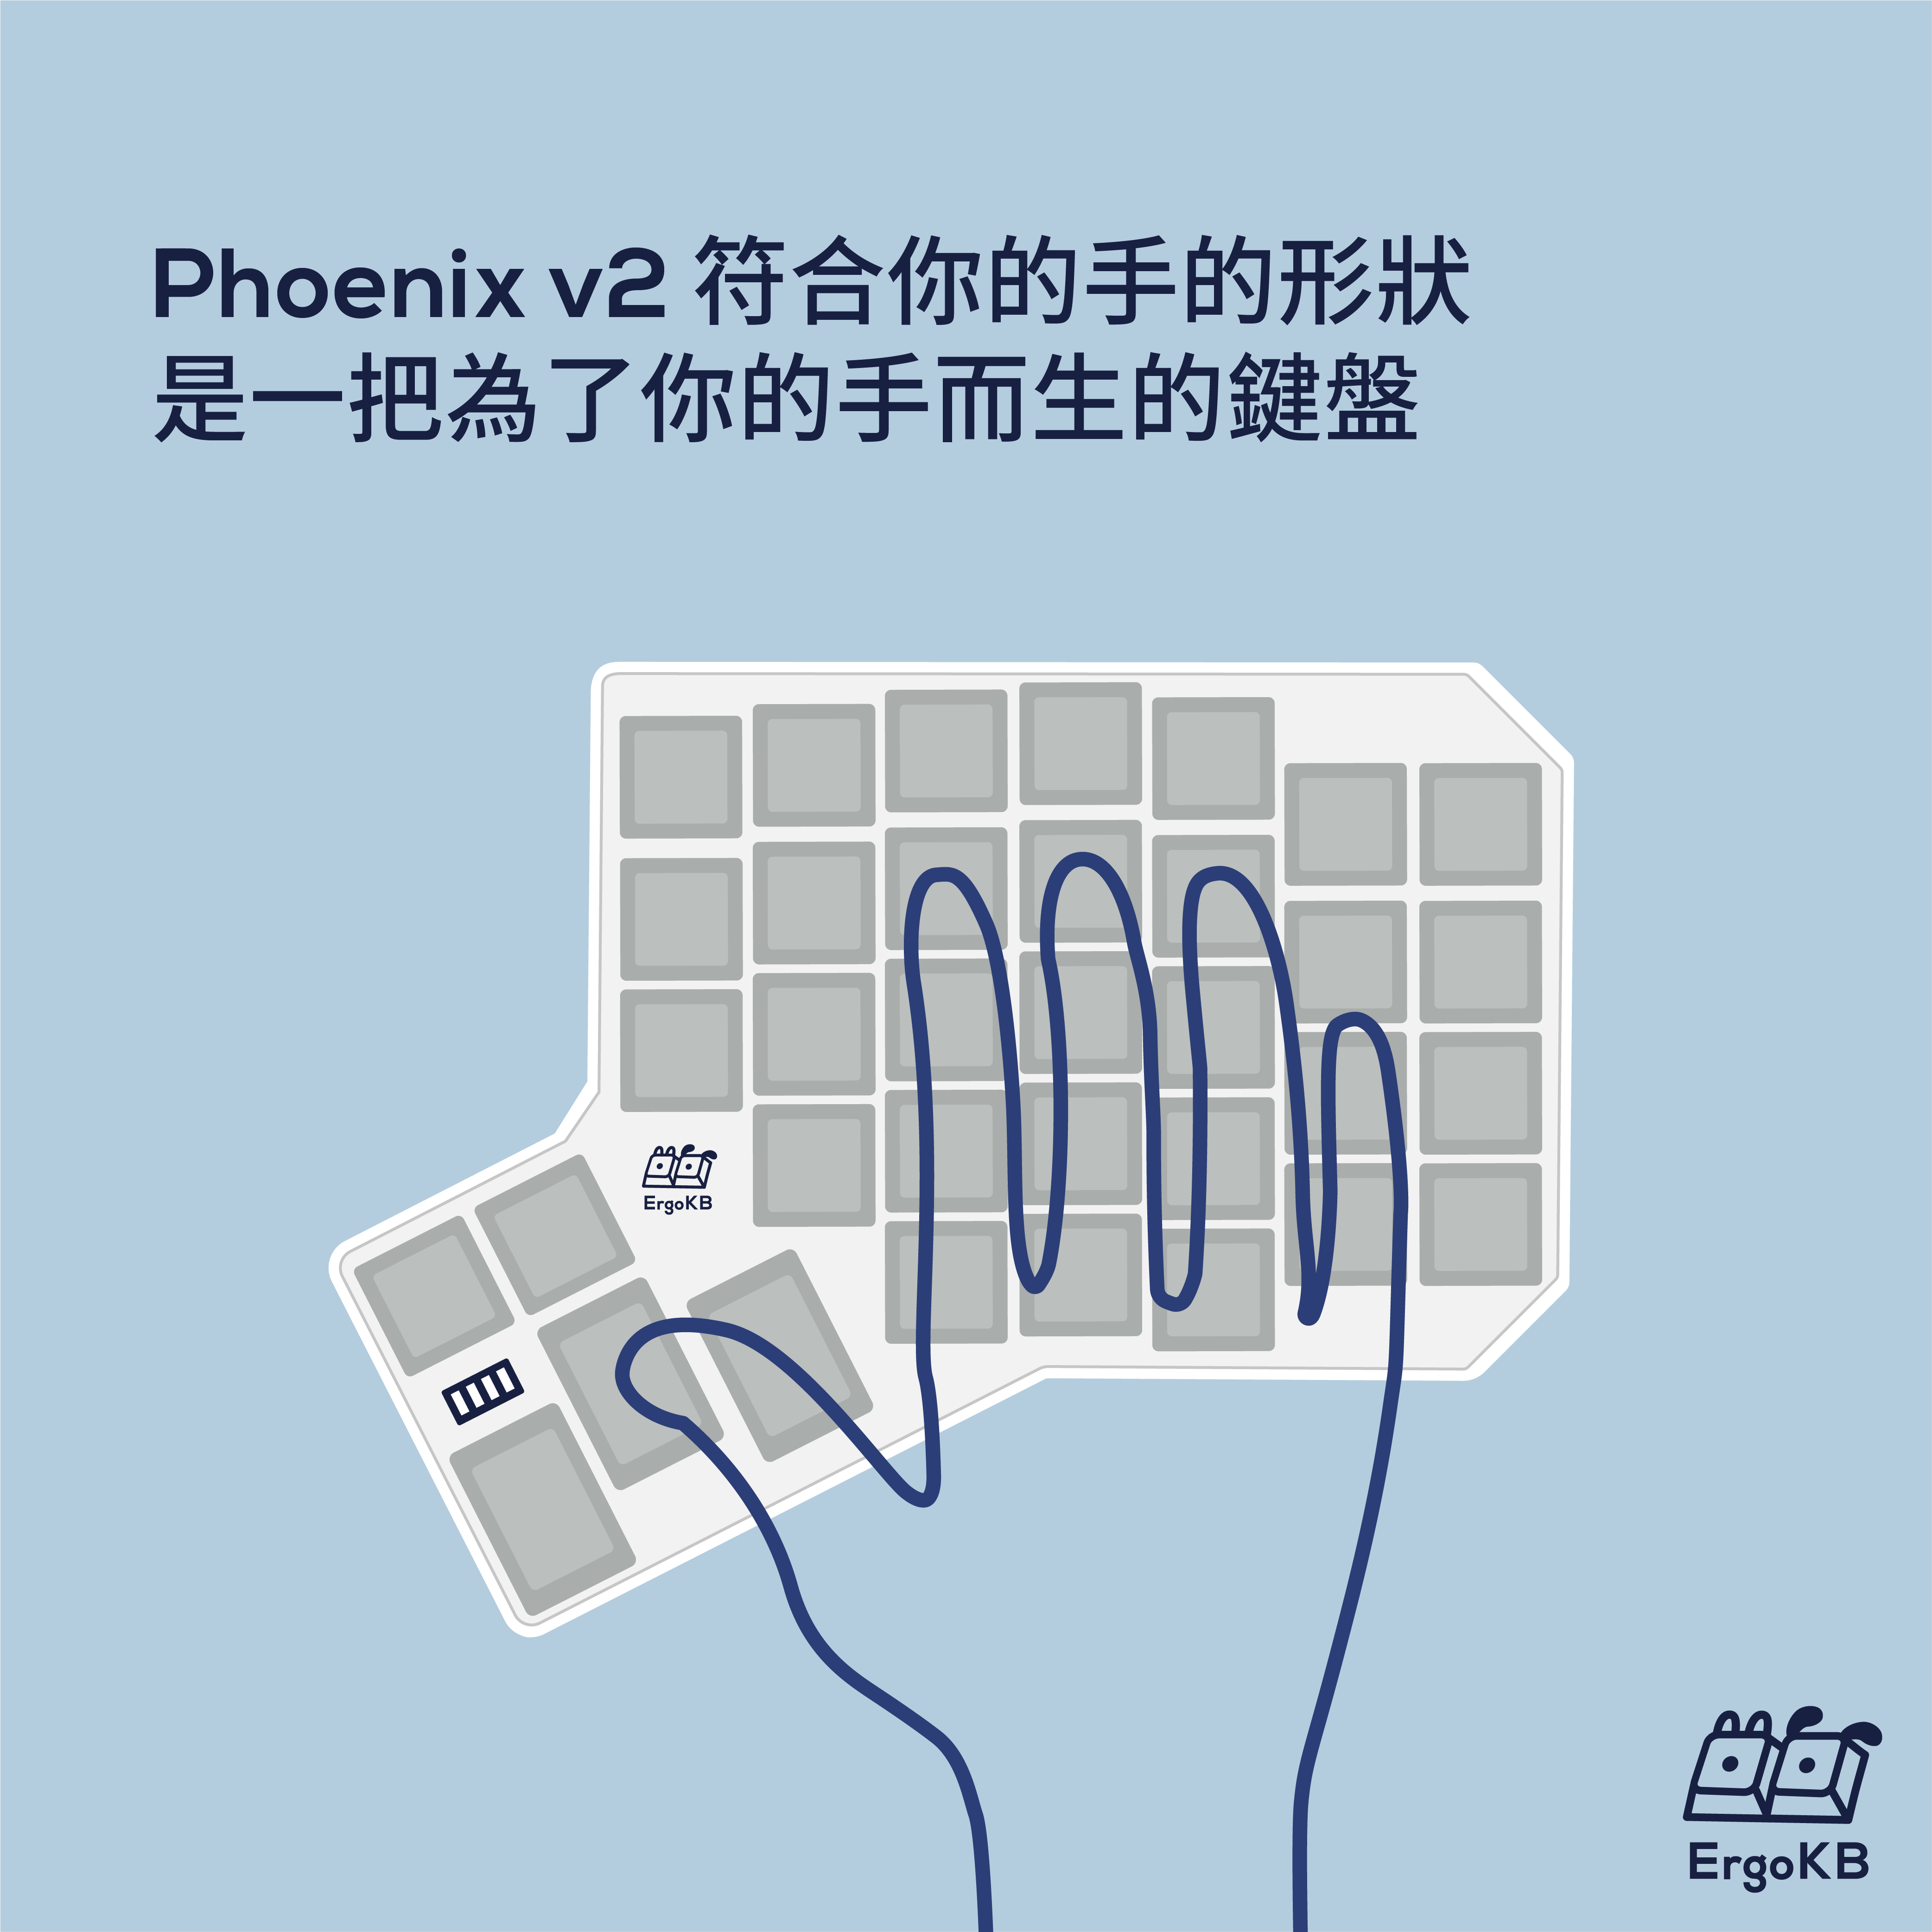 Phoenix 符合你的手的形狀,是一把為了你的手而生的鍵盤